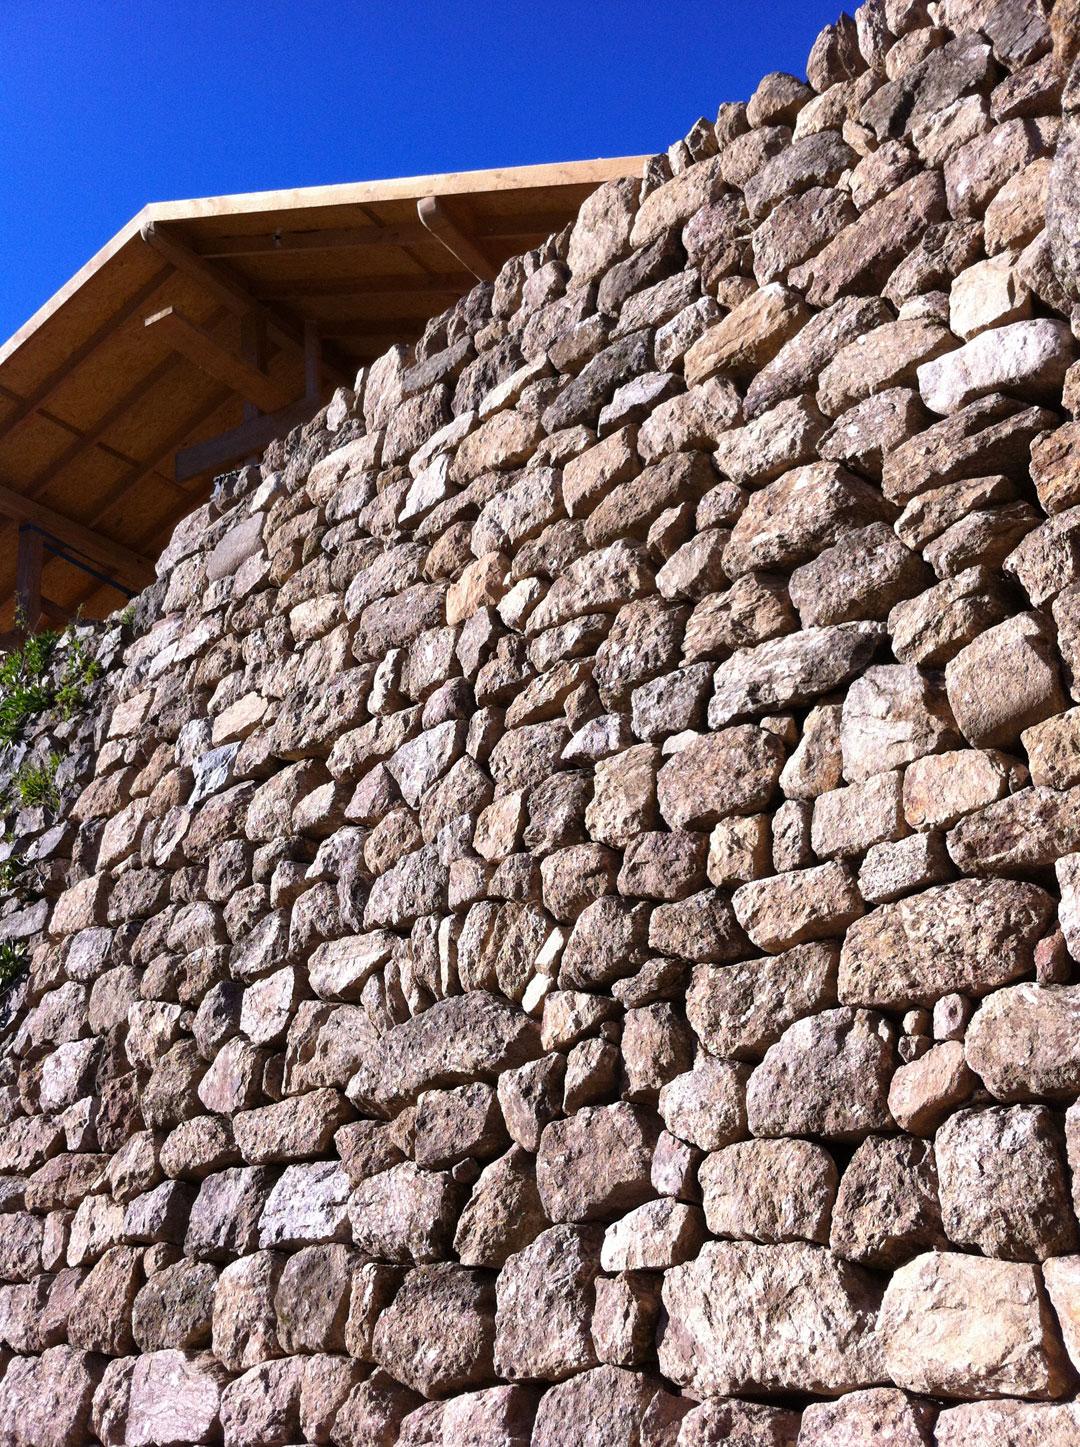 Mur pierre sèche - La Boule